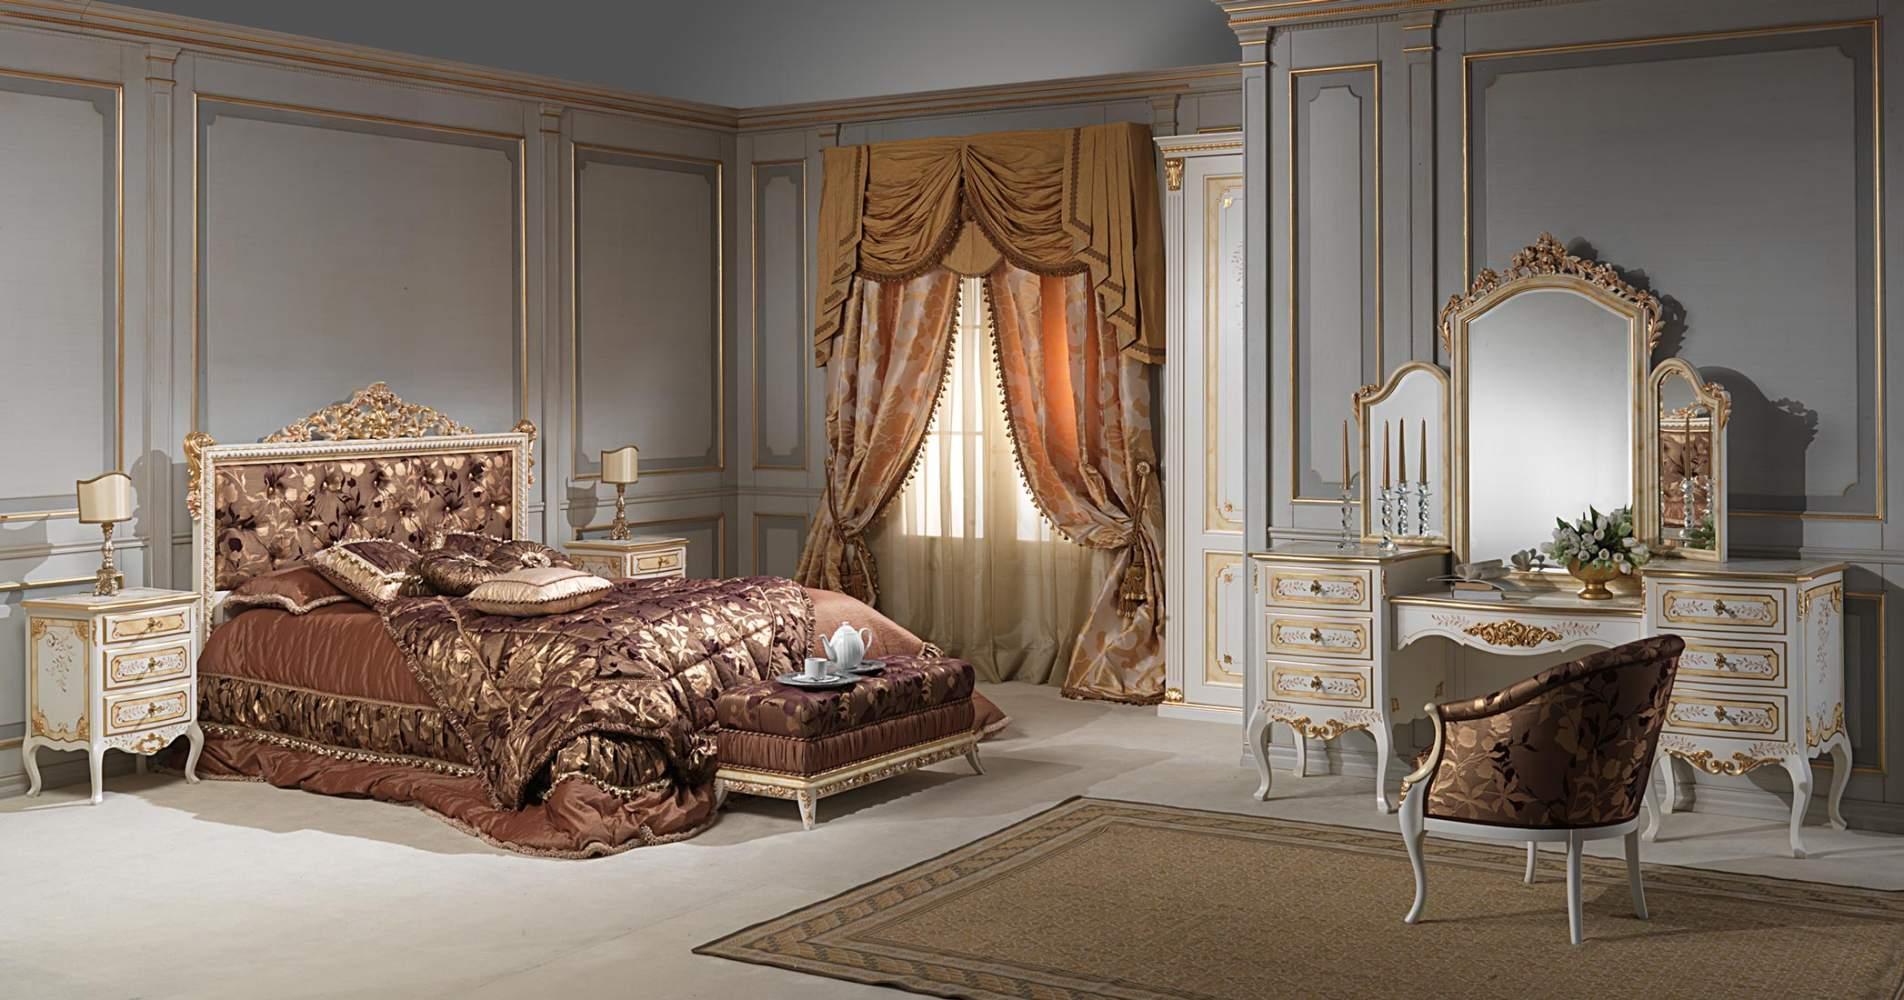 camera barocco francese art 2009 vimercati meda. Black Bedroom Furniture Sets. Home Design Ideas